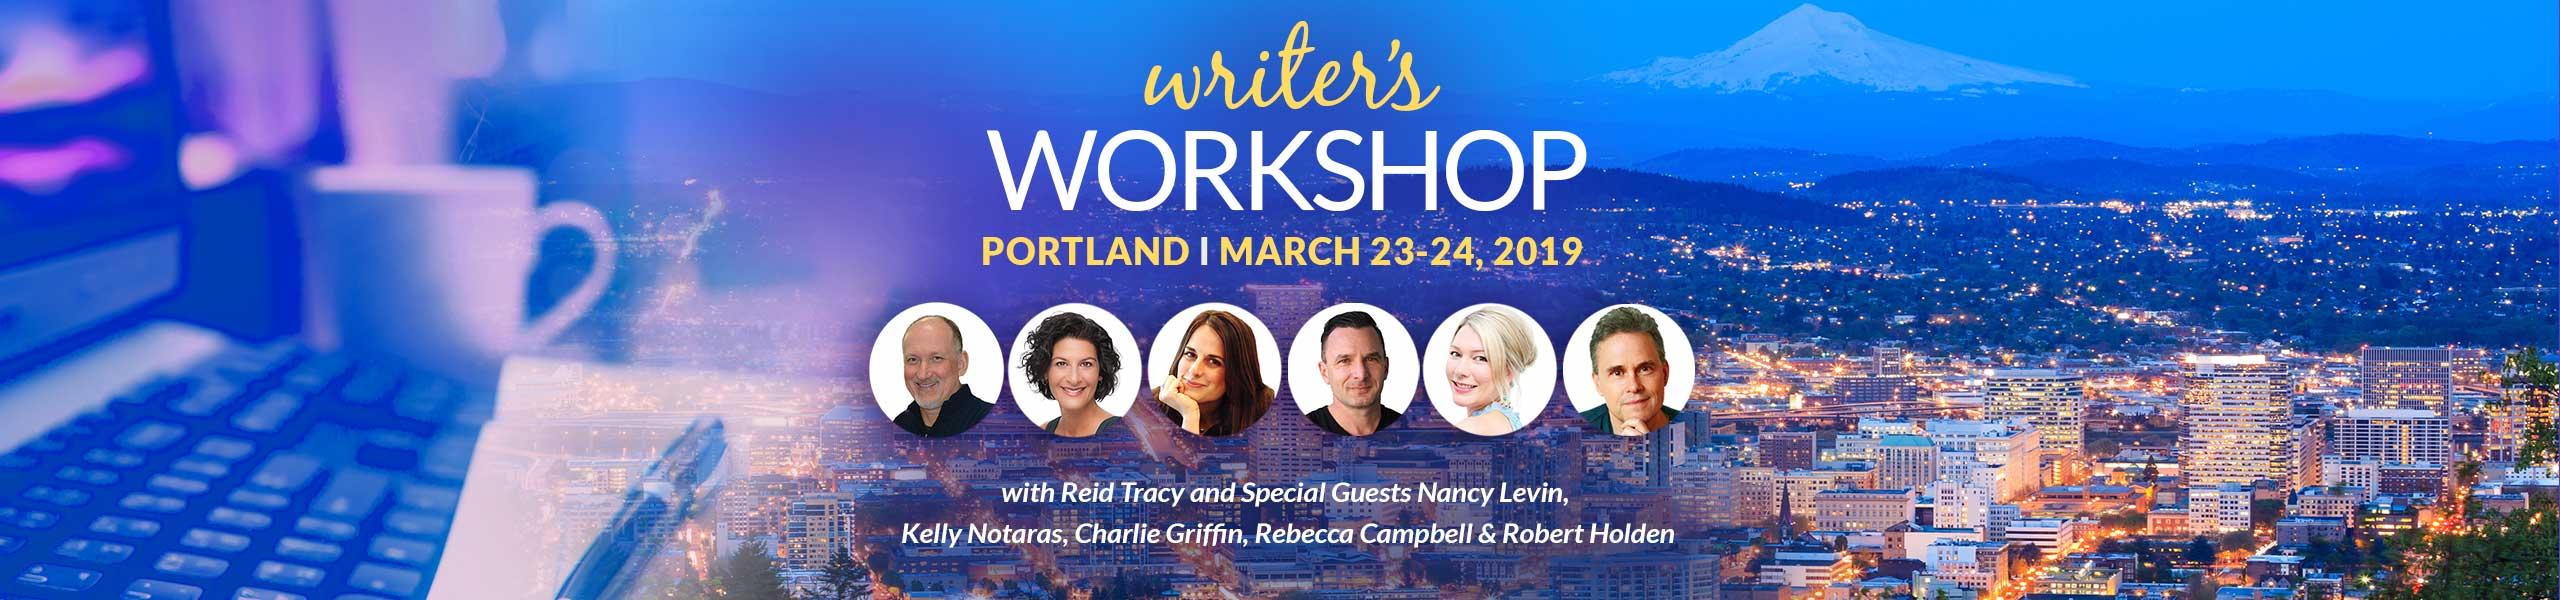 Writer's Workshop - Portland